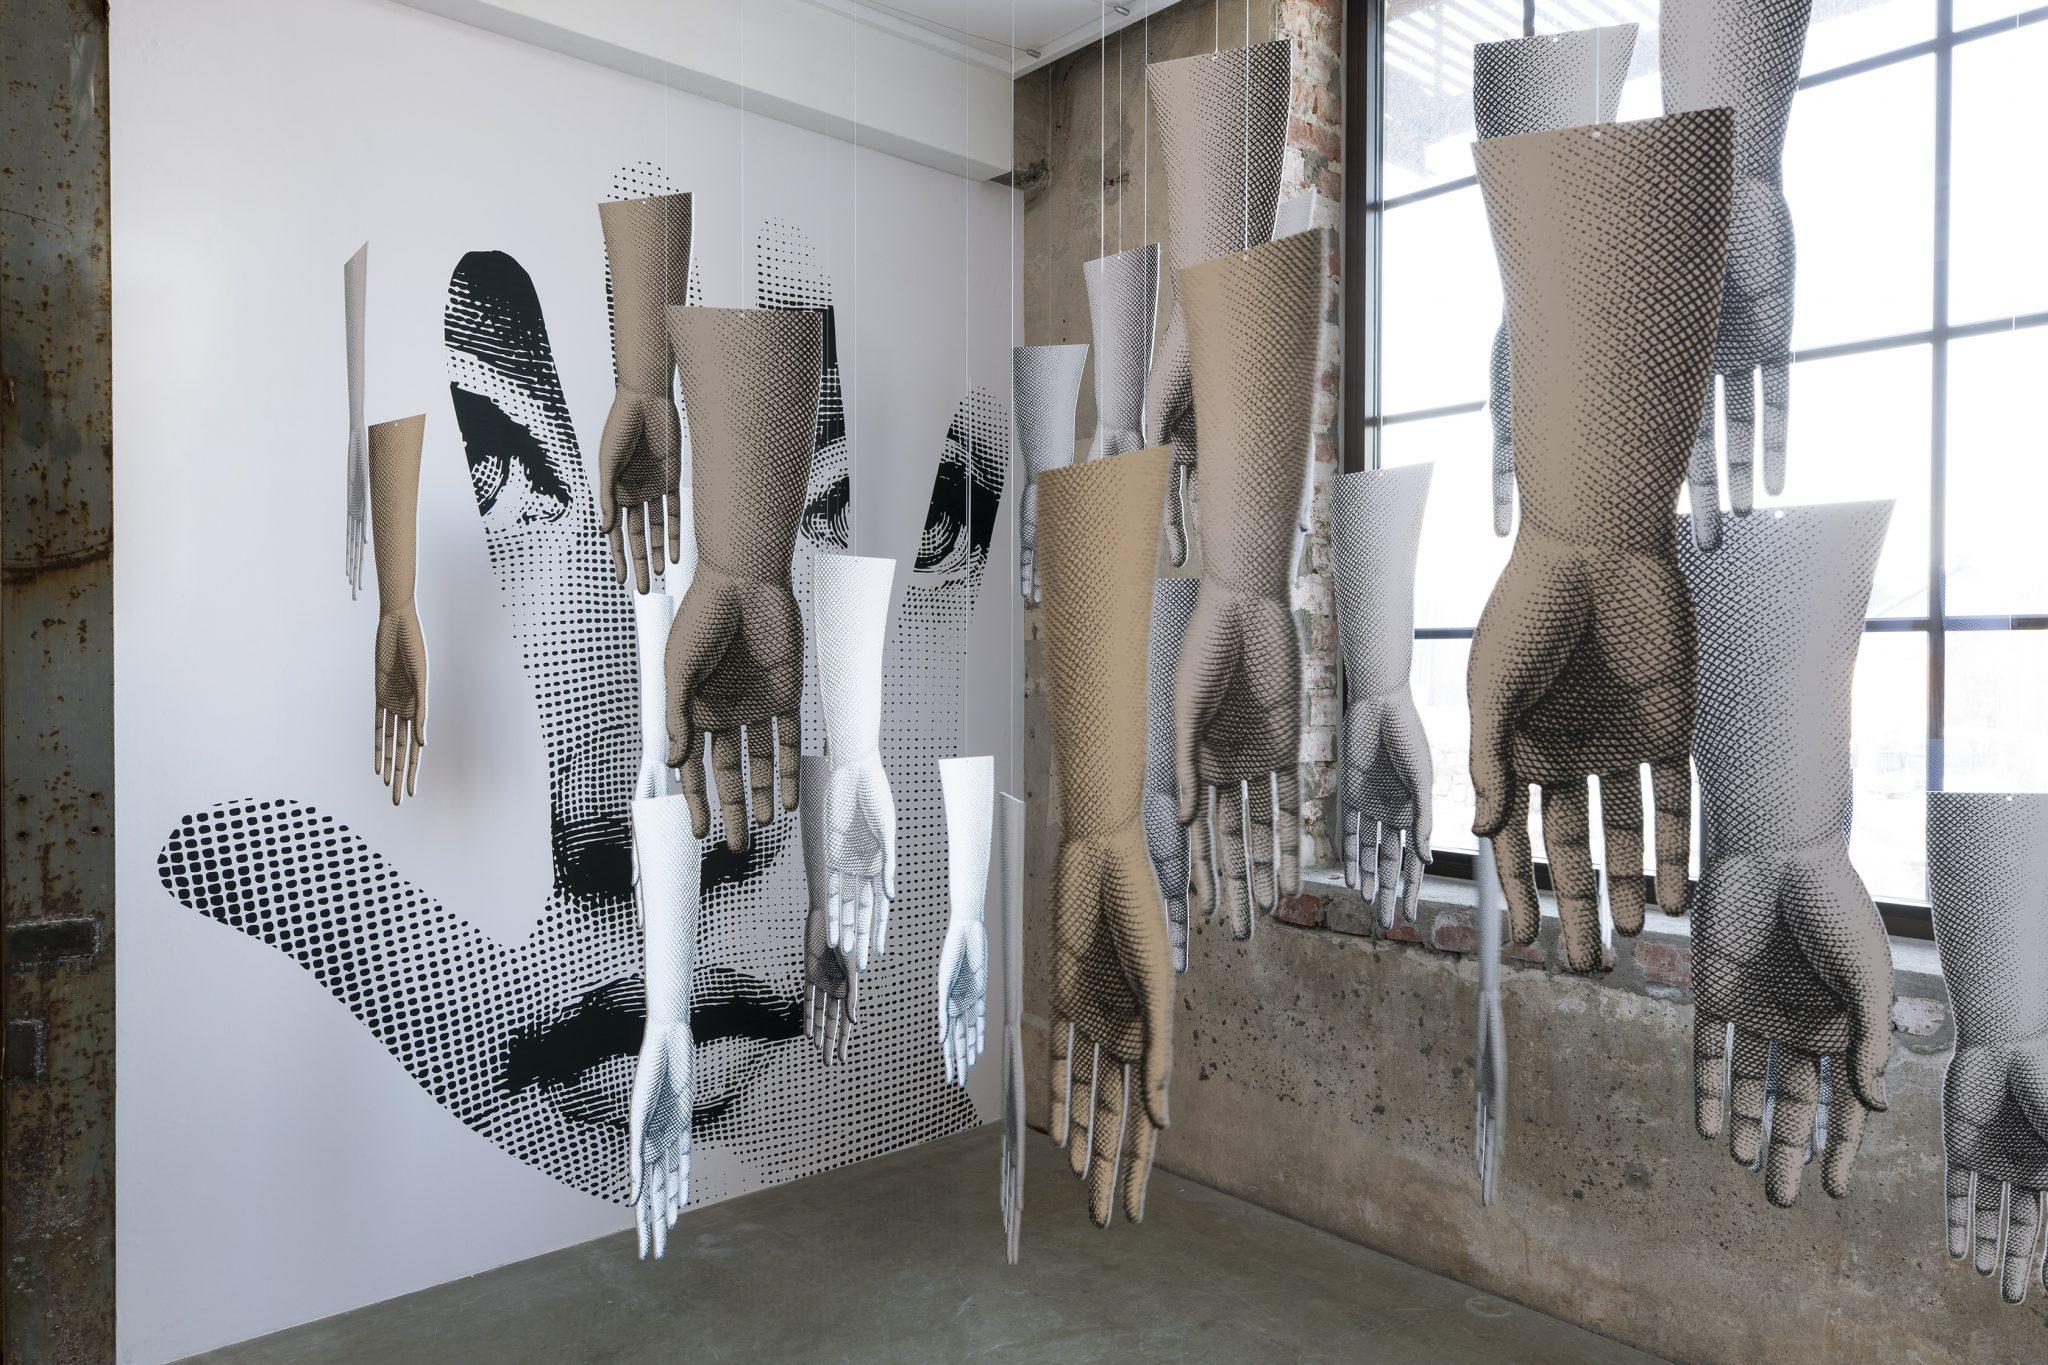 Handmade, Barnaba Fornasetti e Valeria Manzi | Contemporary Chaos, Vestfossen Kunstlaboratorium, photo Nina Ansten